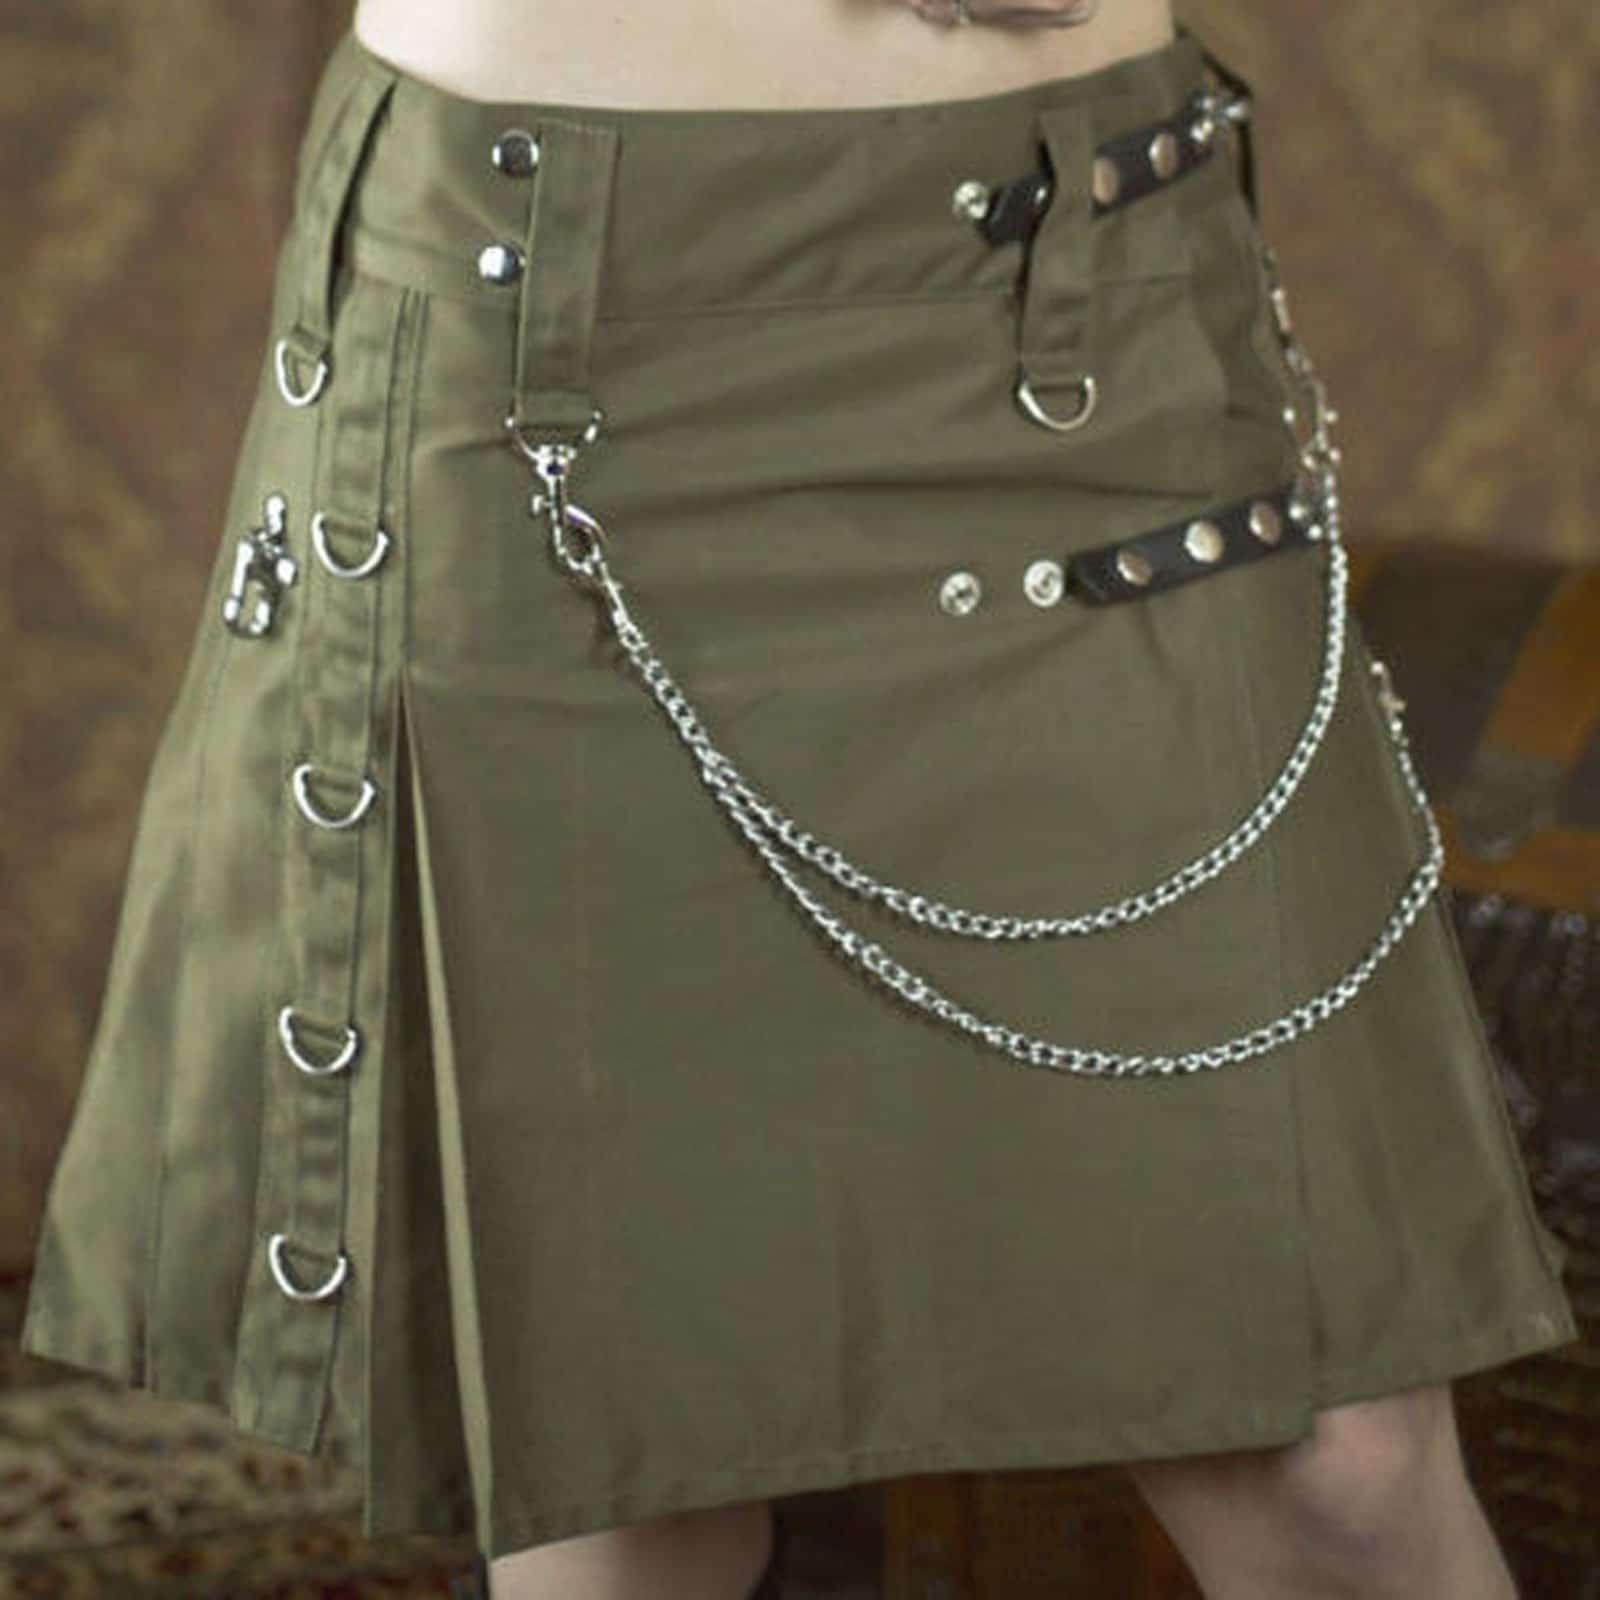 Women Utility Kilt With Leather Straps Womens Utility